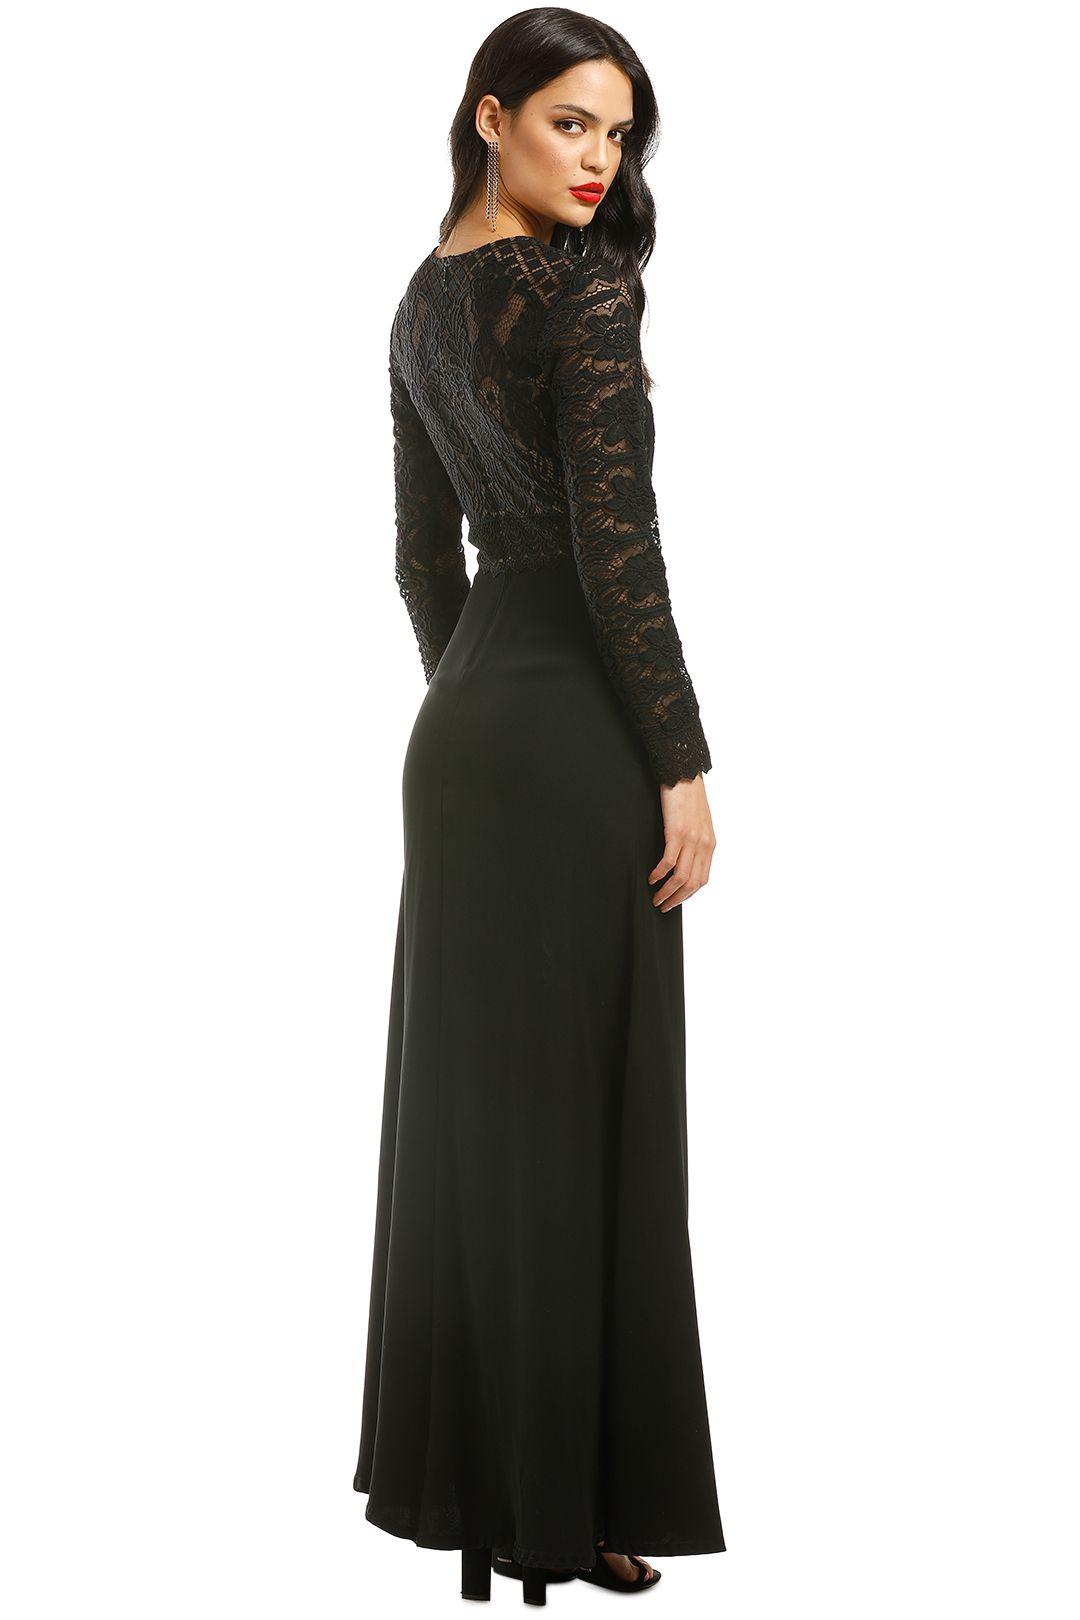 Tadashi-Shoji-Benes-Long-Sleeve-Gown-Black-Back